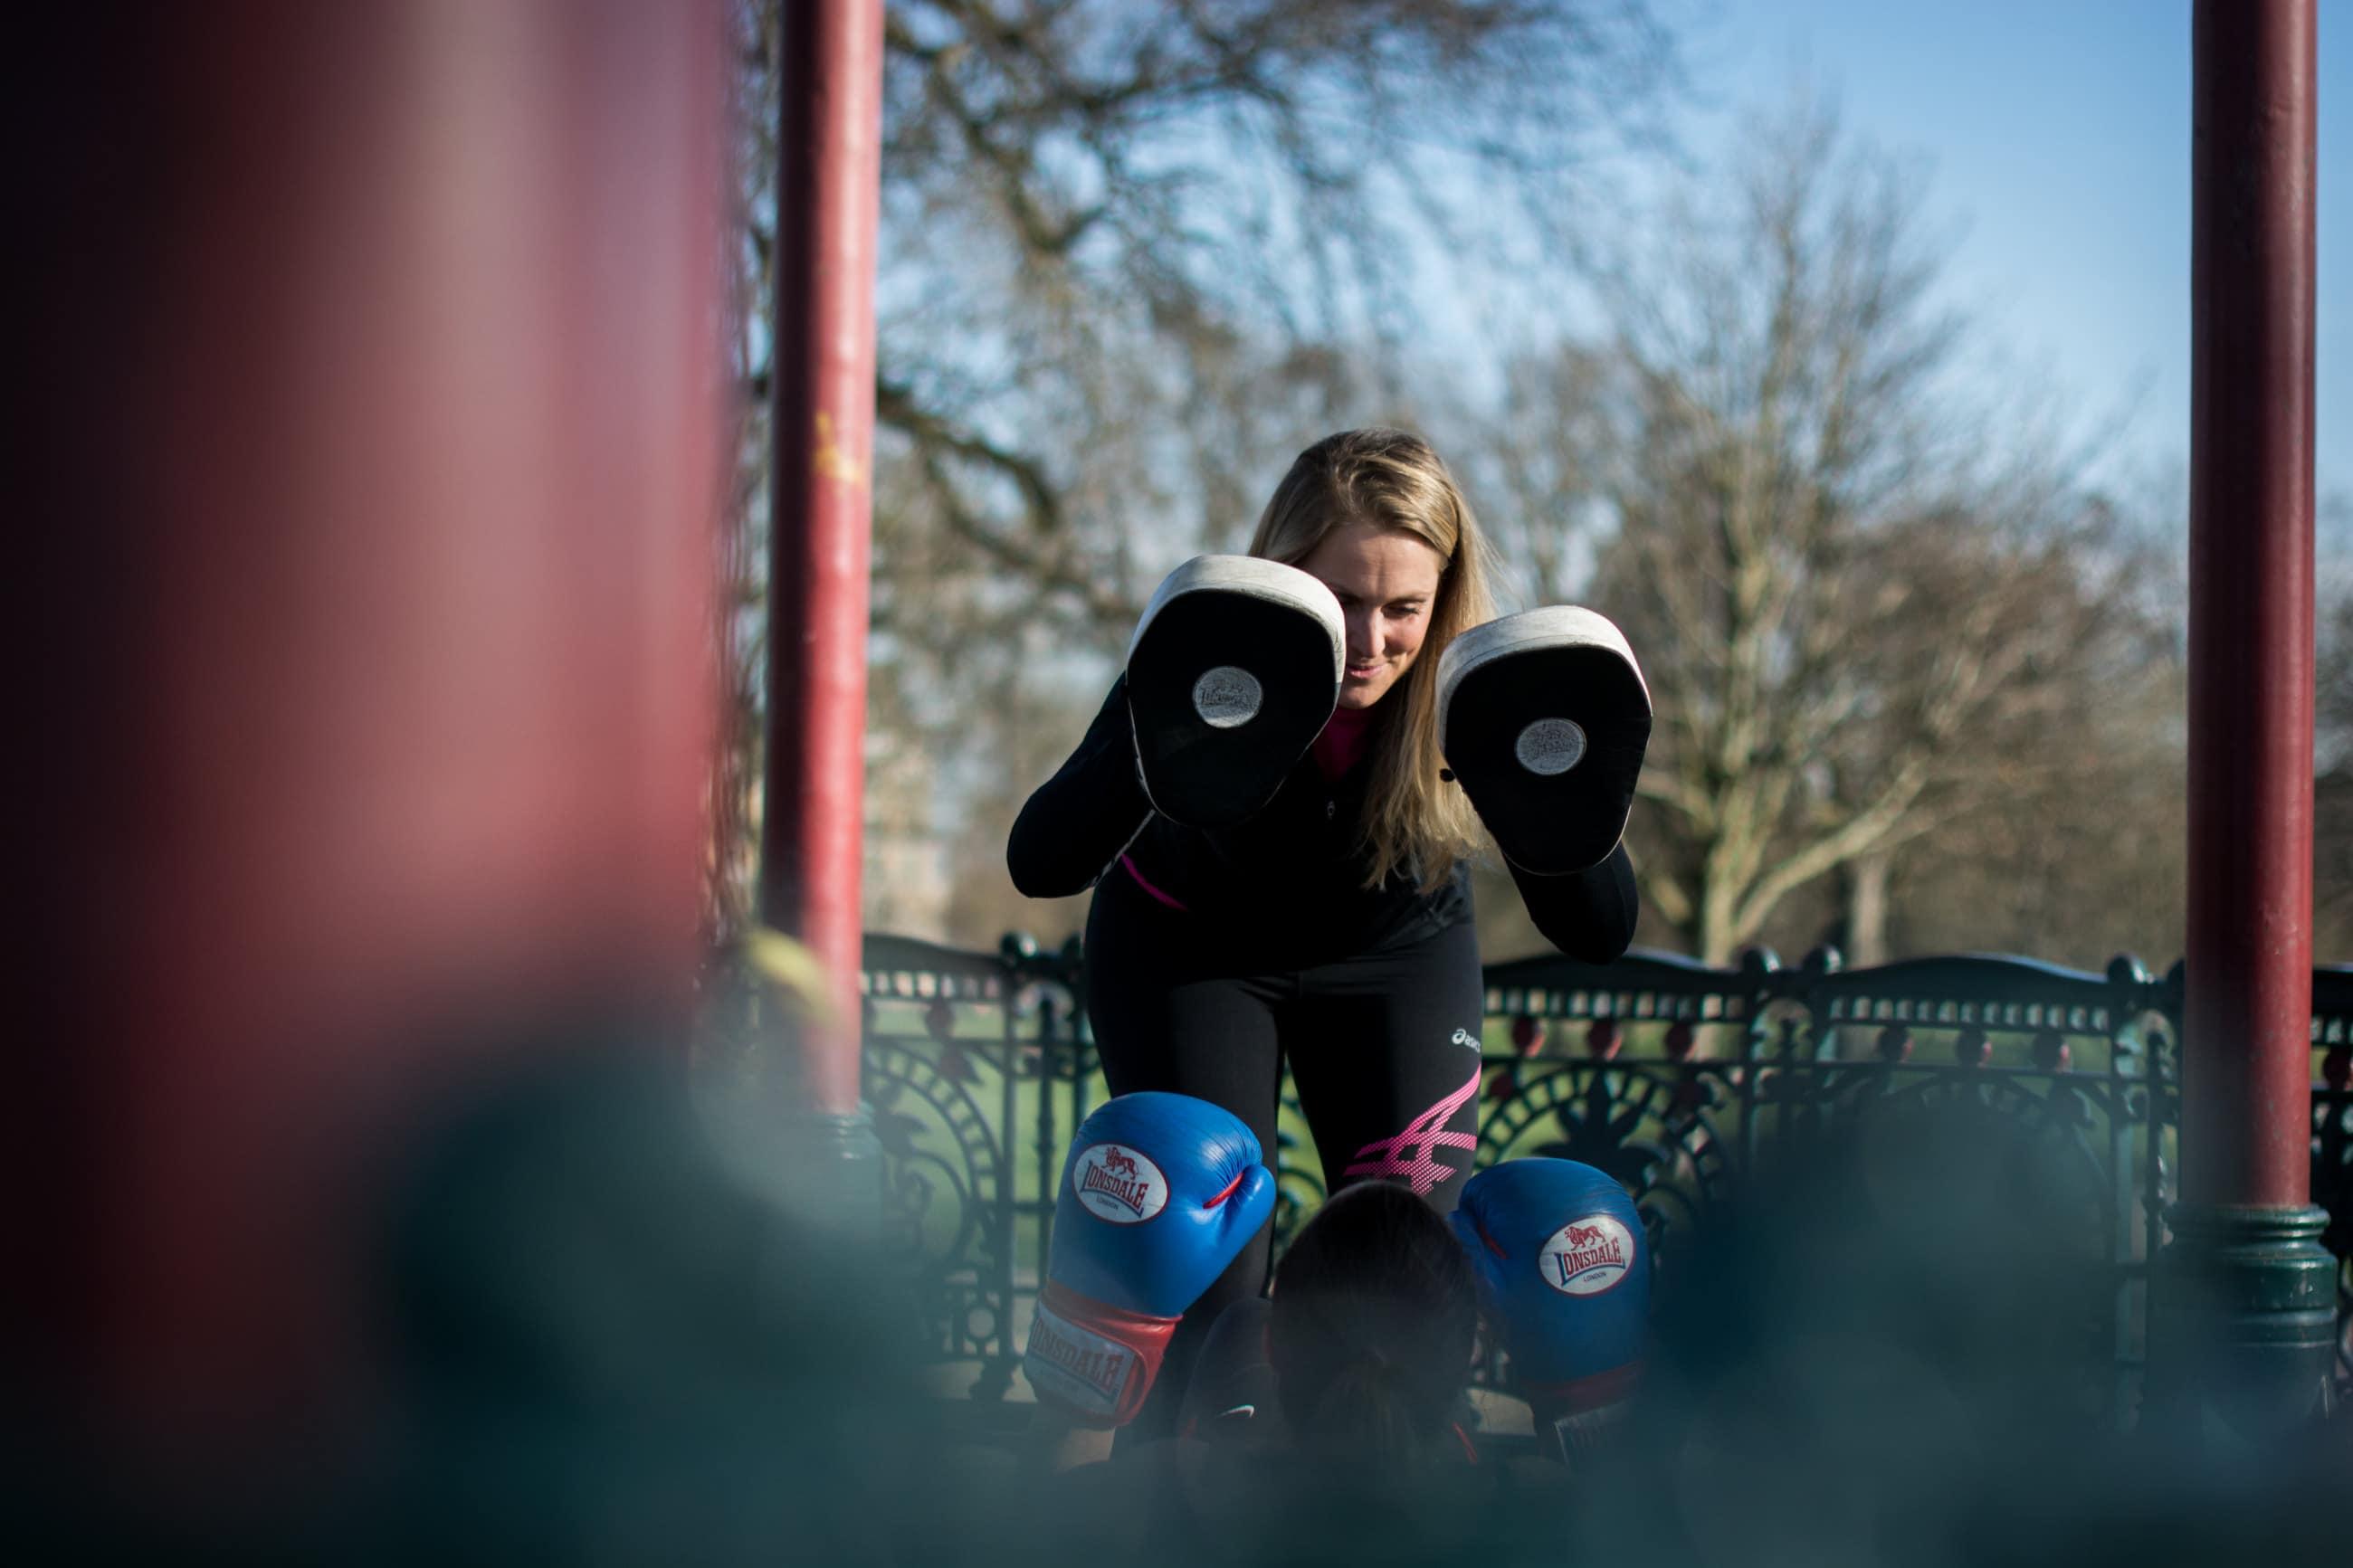 Boxing, Sarah O'Neill, London Personal Trainer | Matt Badenoch Photography